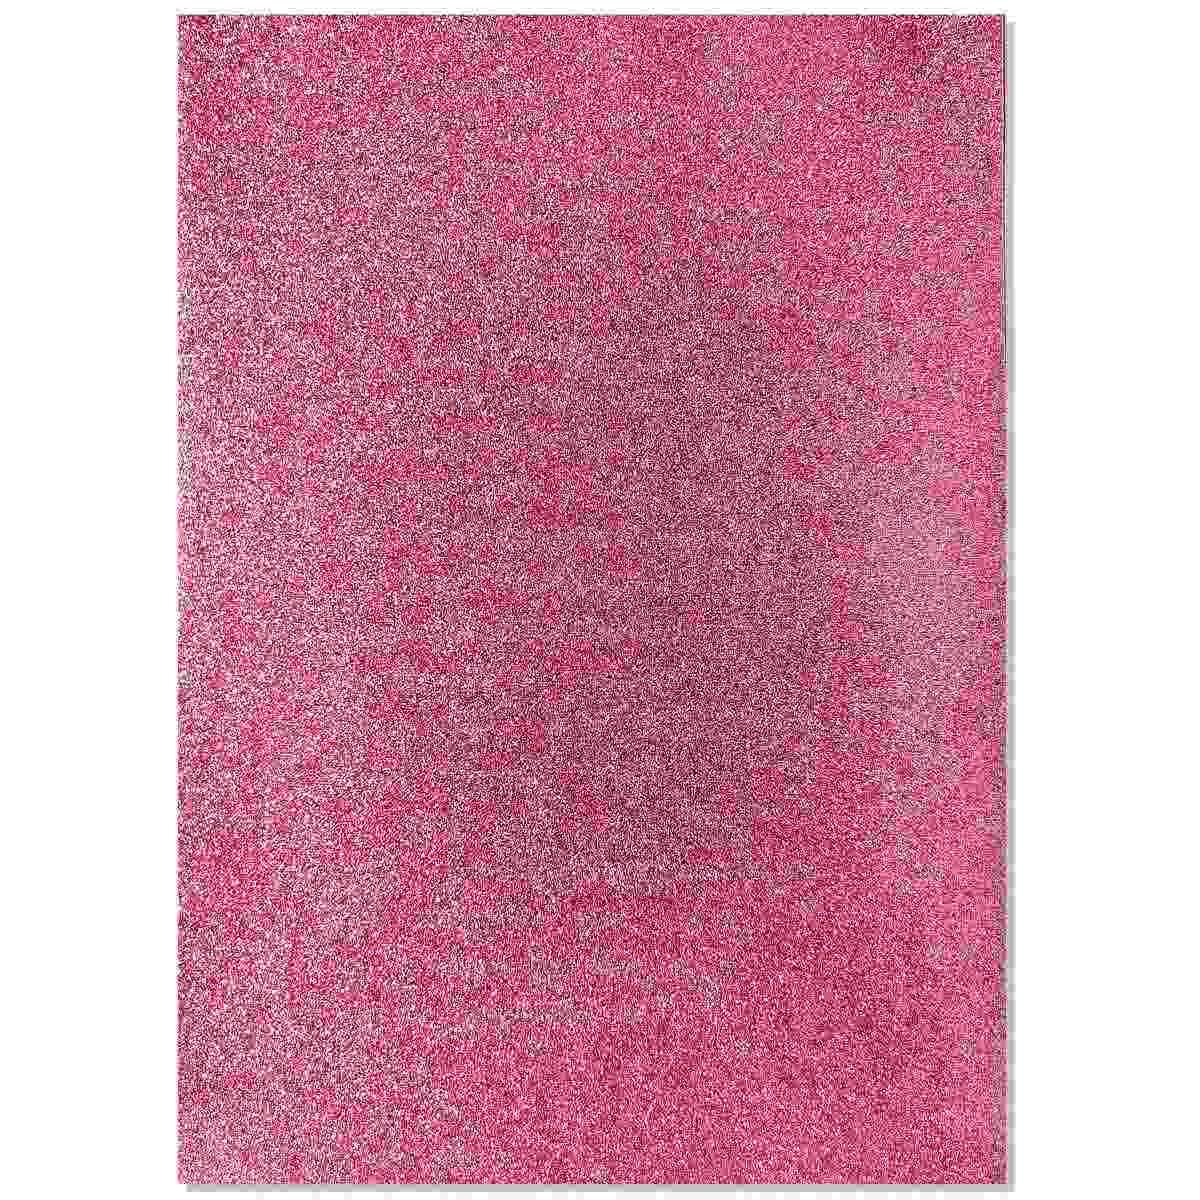 Glitter Foam A3 Sheet Without Sticker Baby Pink